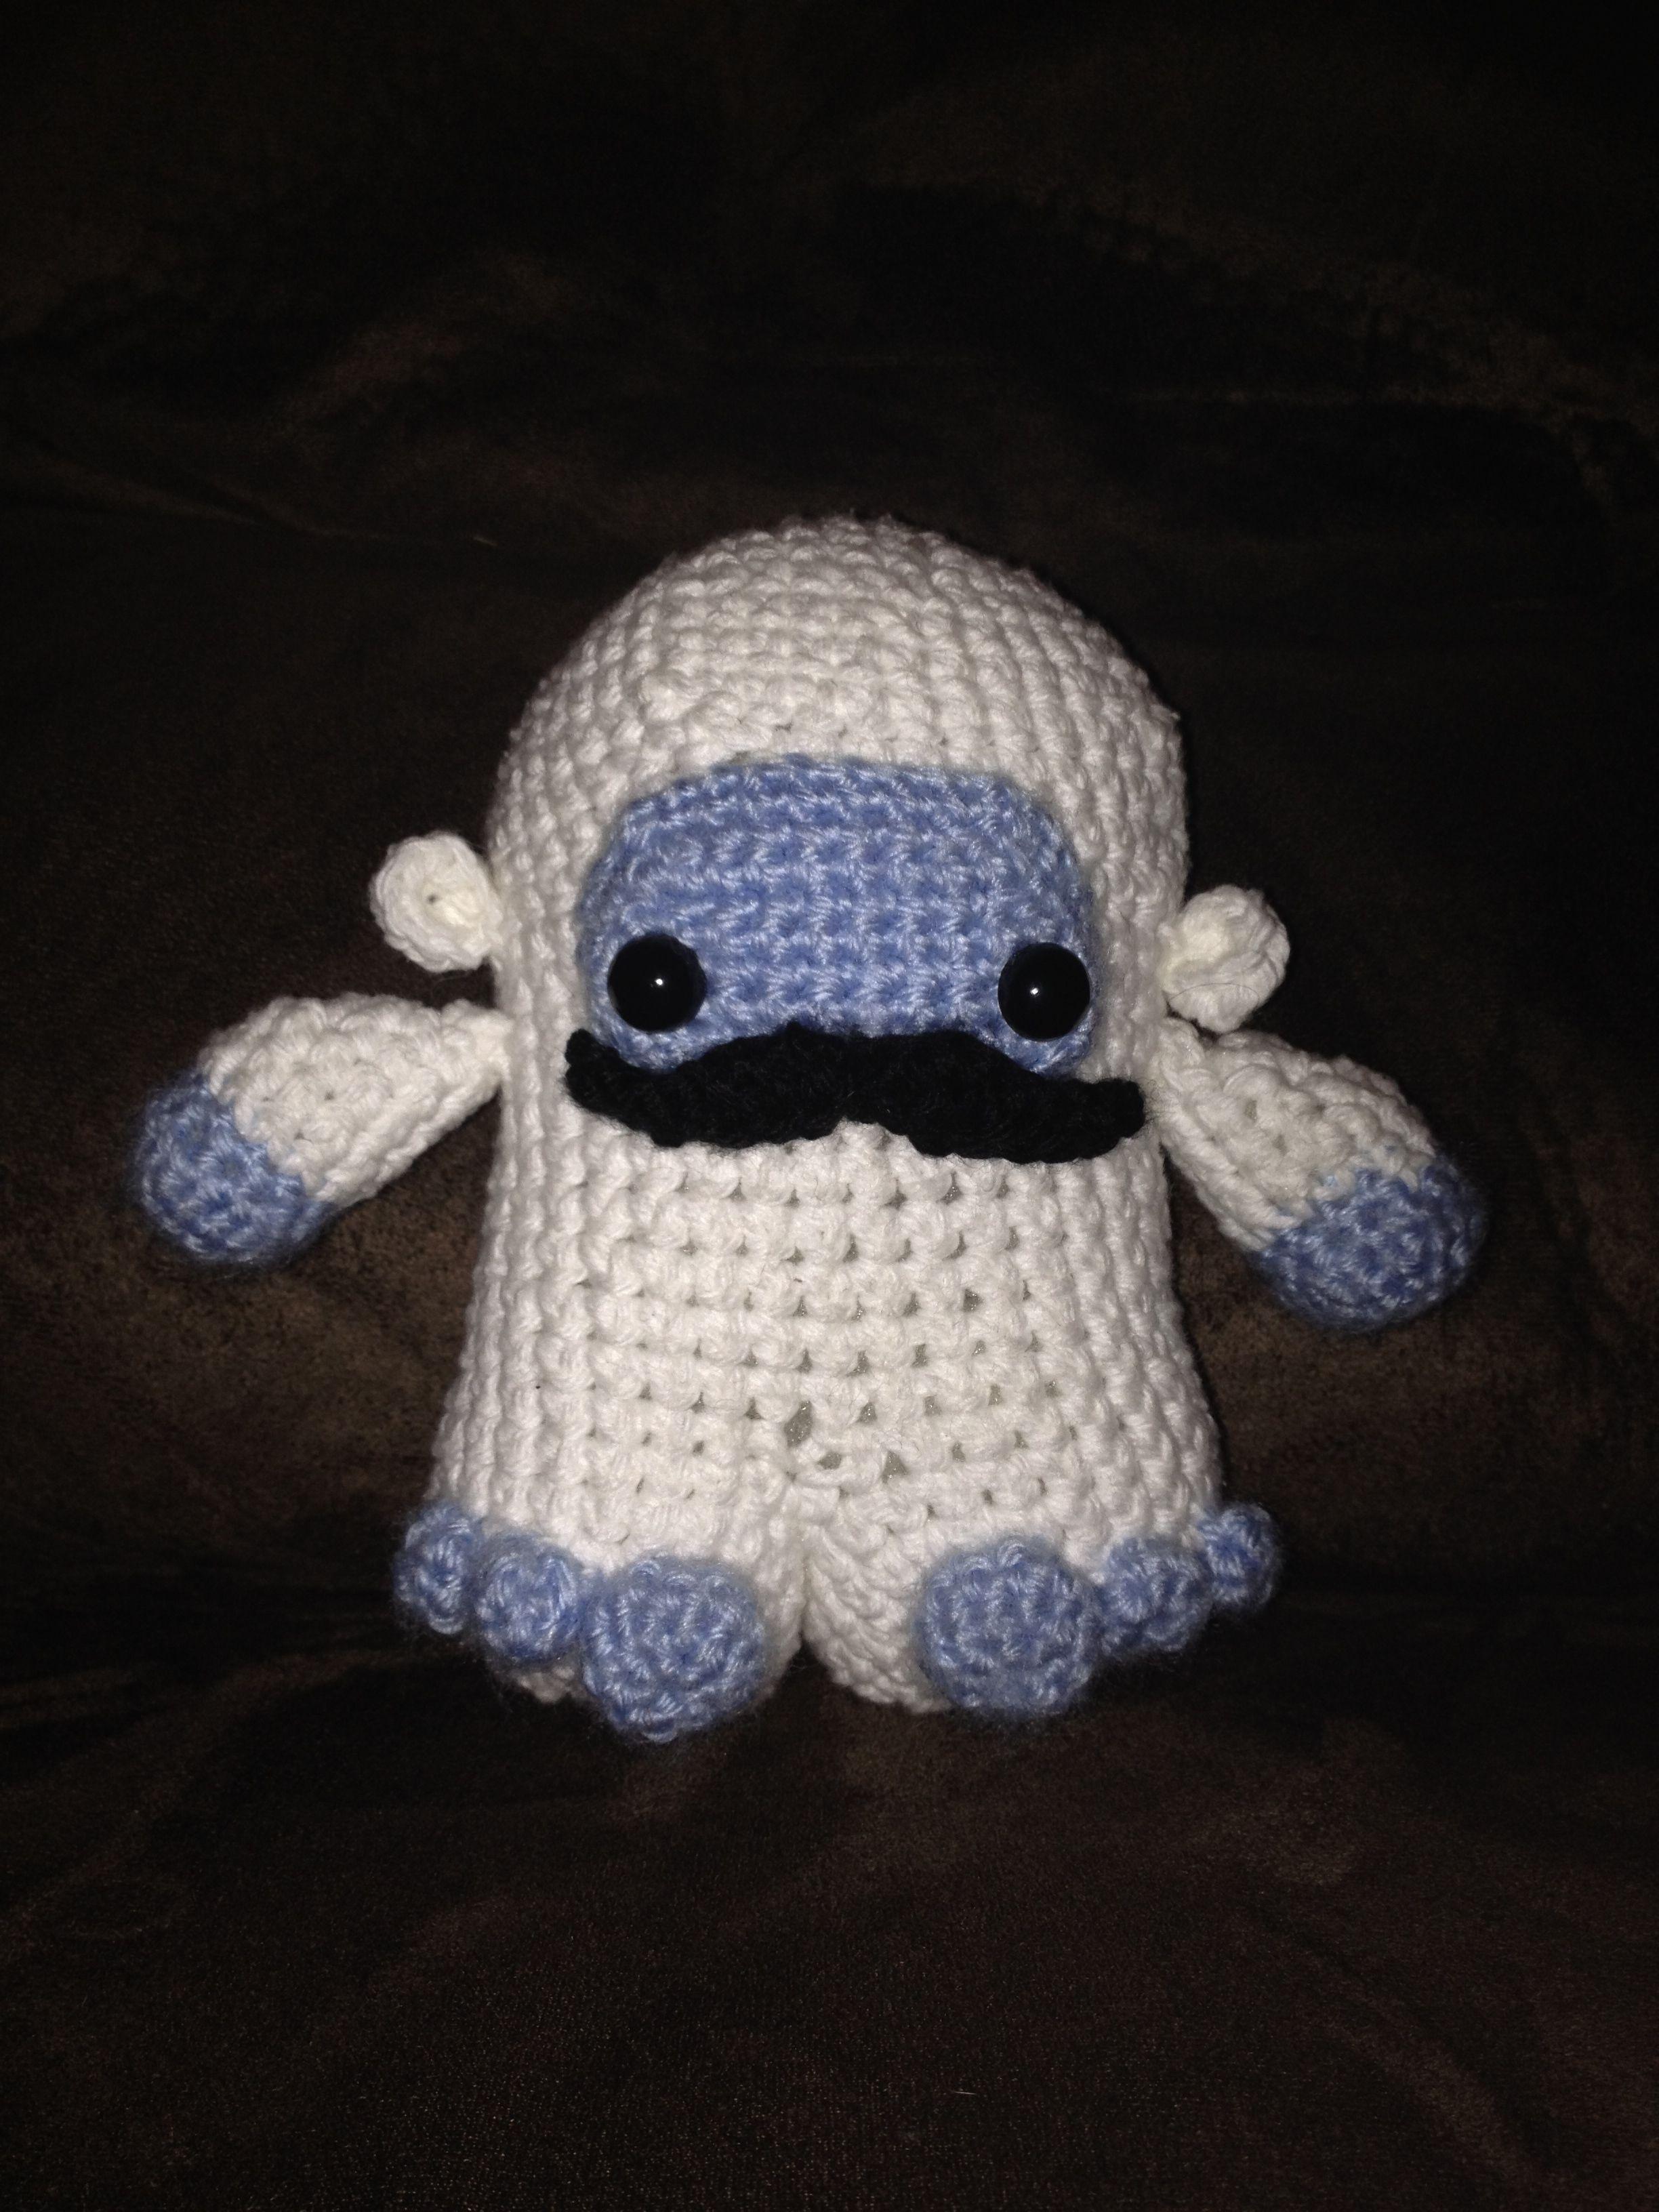 Crochet amigurumi hipster yeti with mustache yeti pinterest crochet amigurumi hipster yeti with mustache bankloansurffo Images